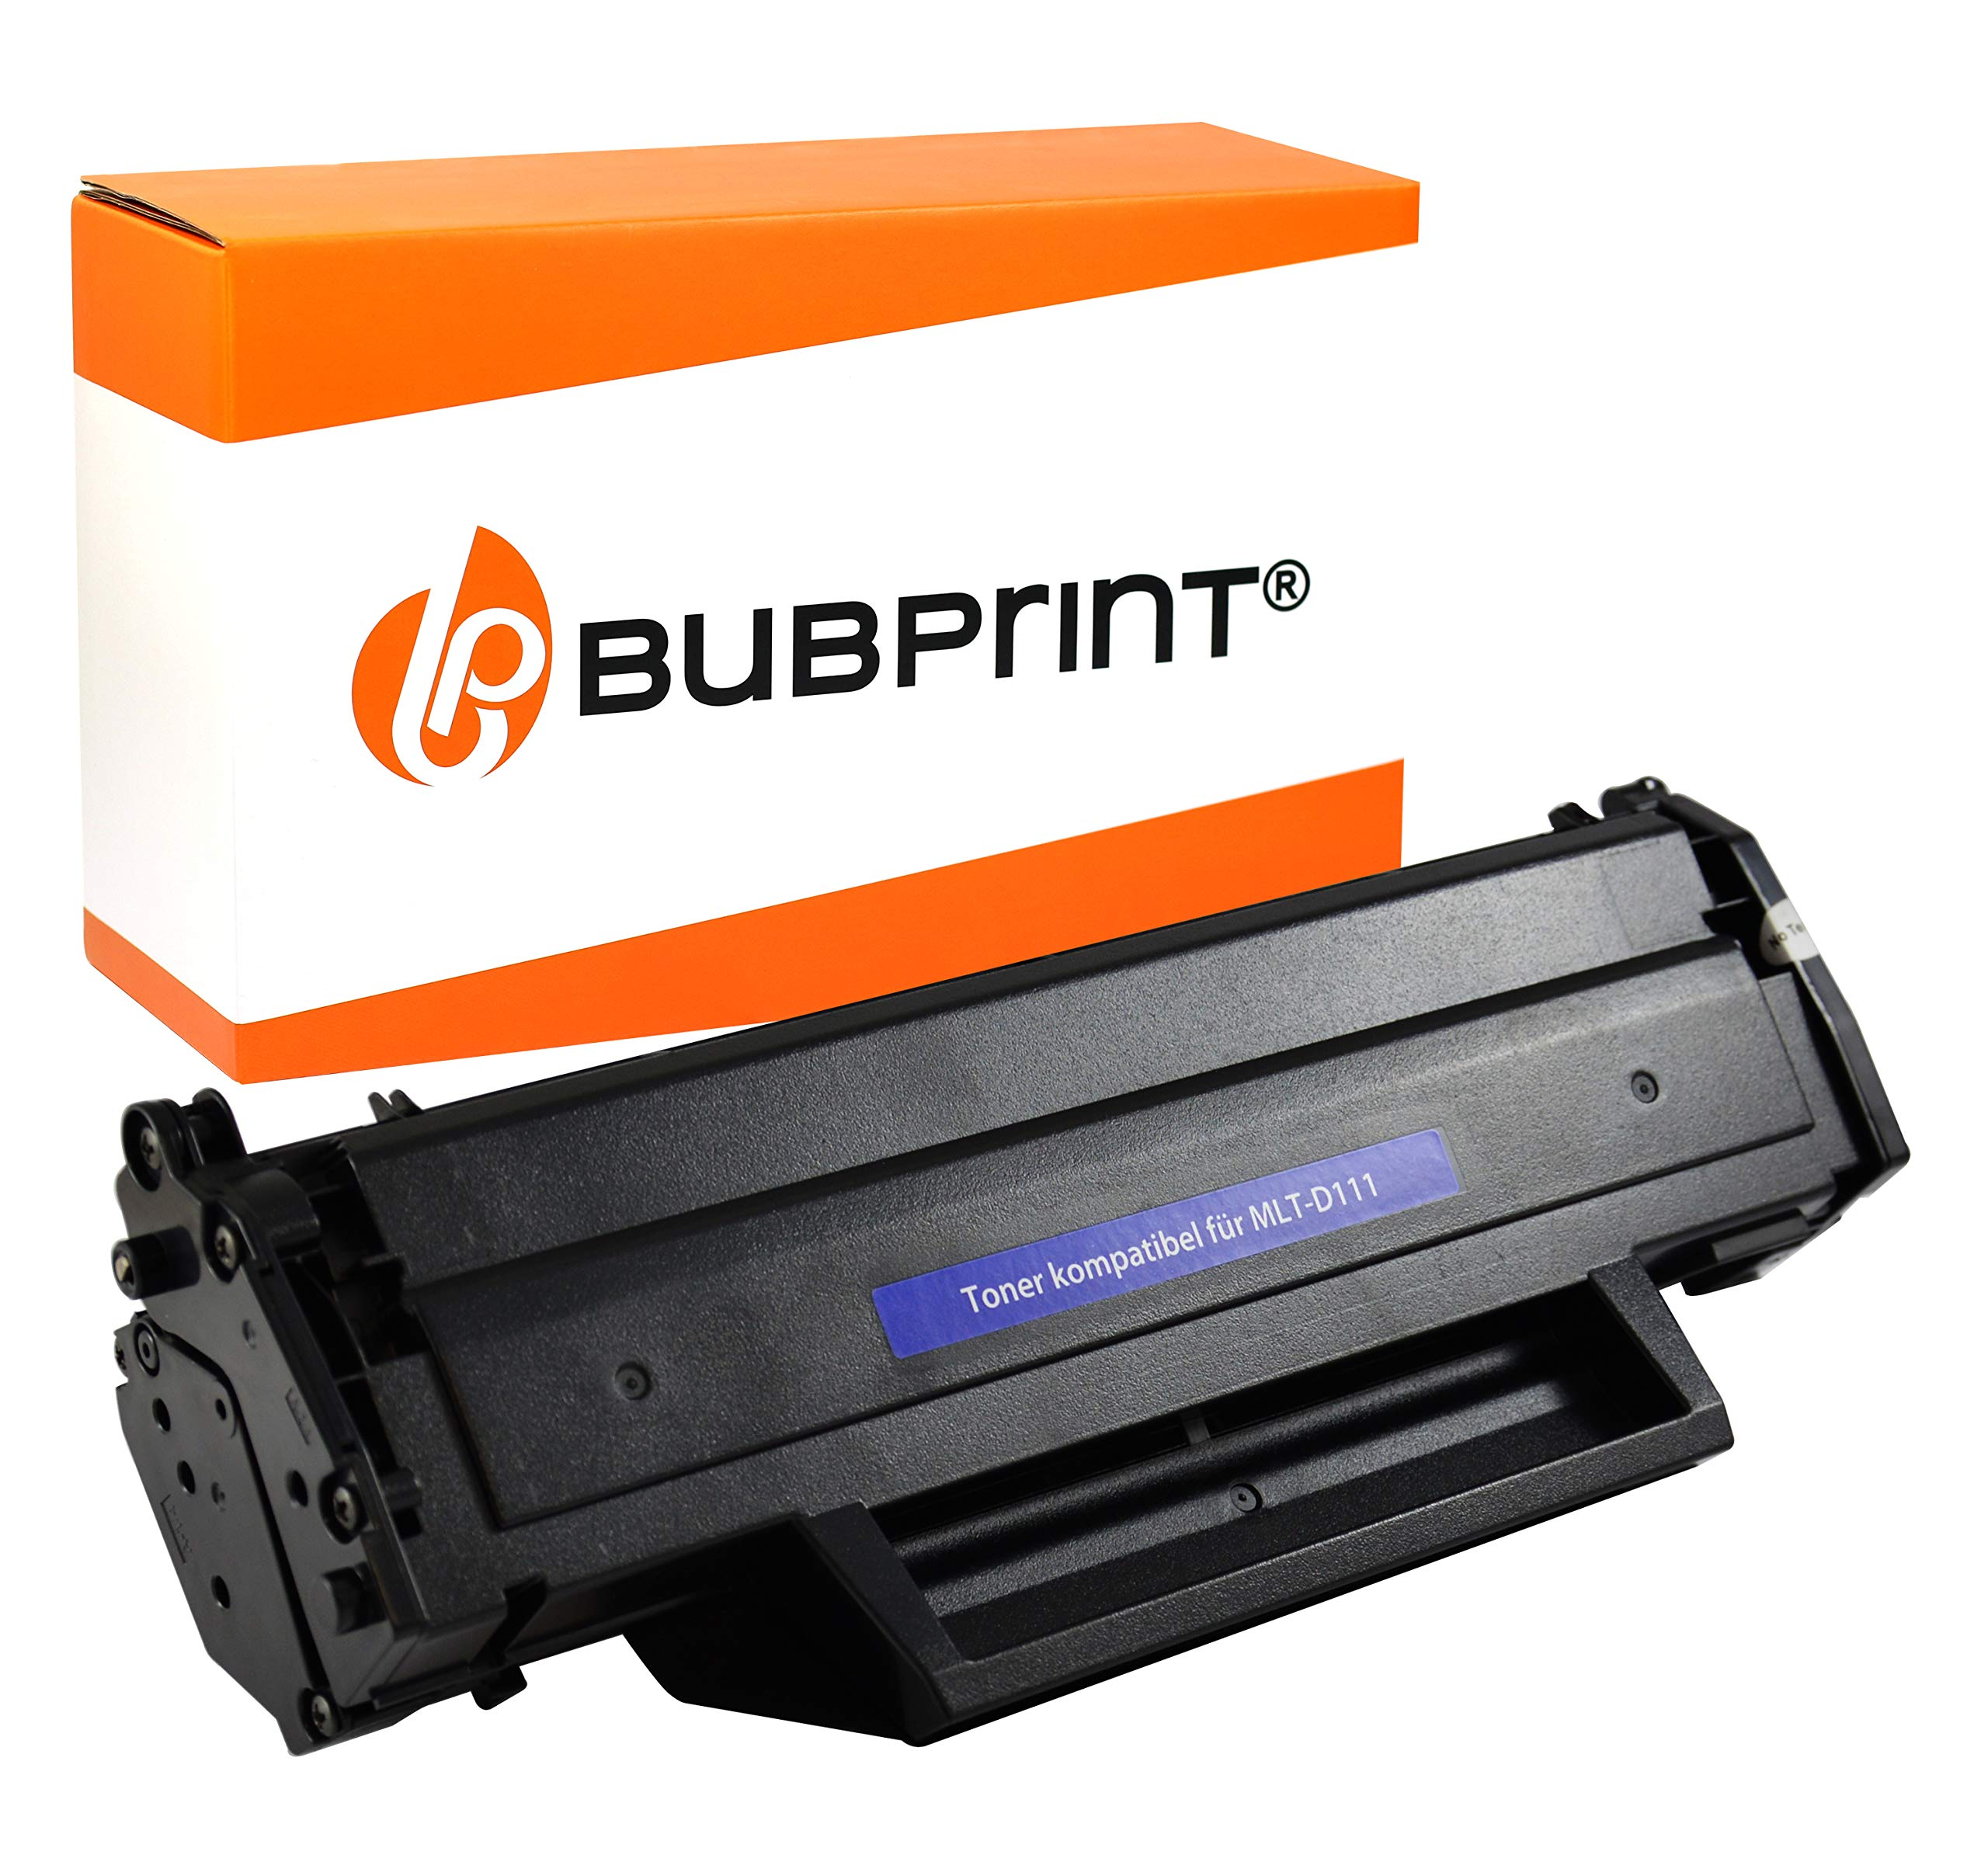 Bubprint-Toner-kompatibel-fr-Samsung-MLT-D111S-MLT-D111S-fr-Xpress-M2020-M2022-M2022W-M2026-M2026W-M2070-M2070F-M2070FW-M2070W-SL-M2022W-Schwarz